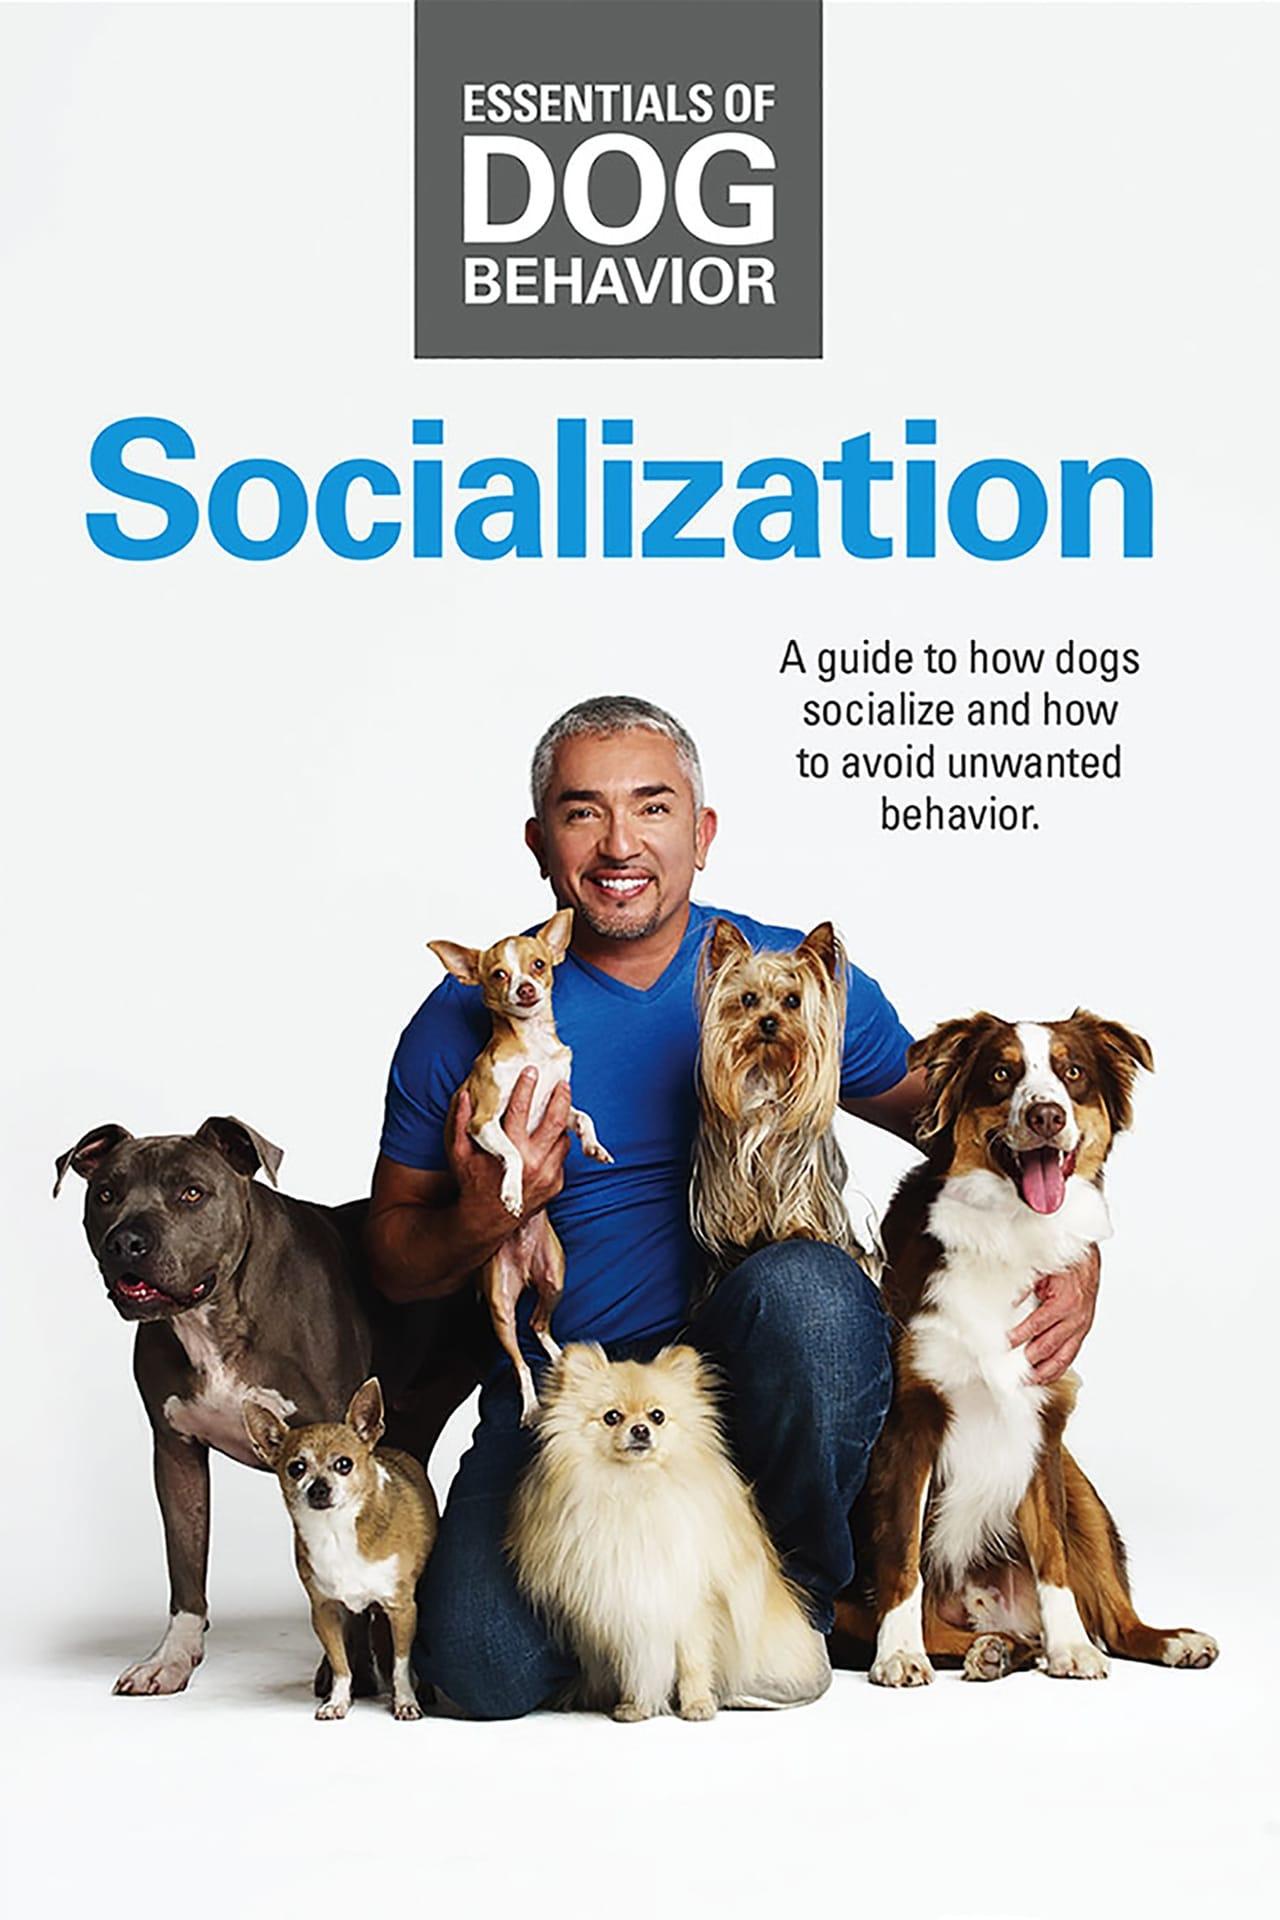 Essentials of Dog Behavior: Socialization